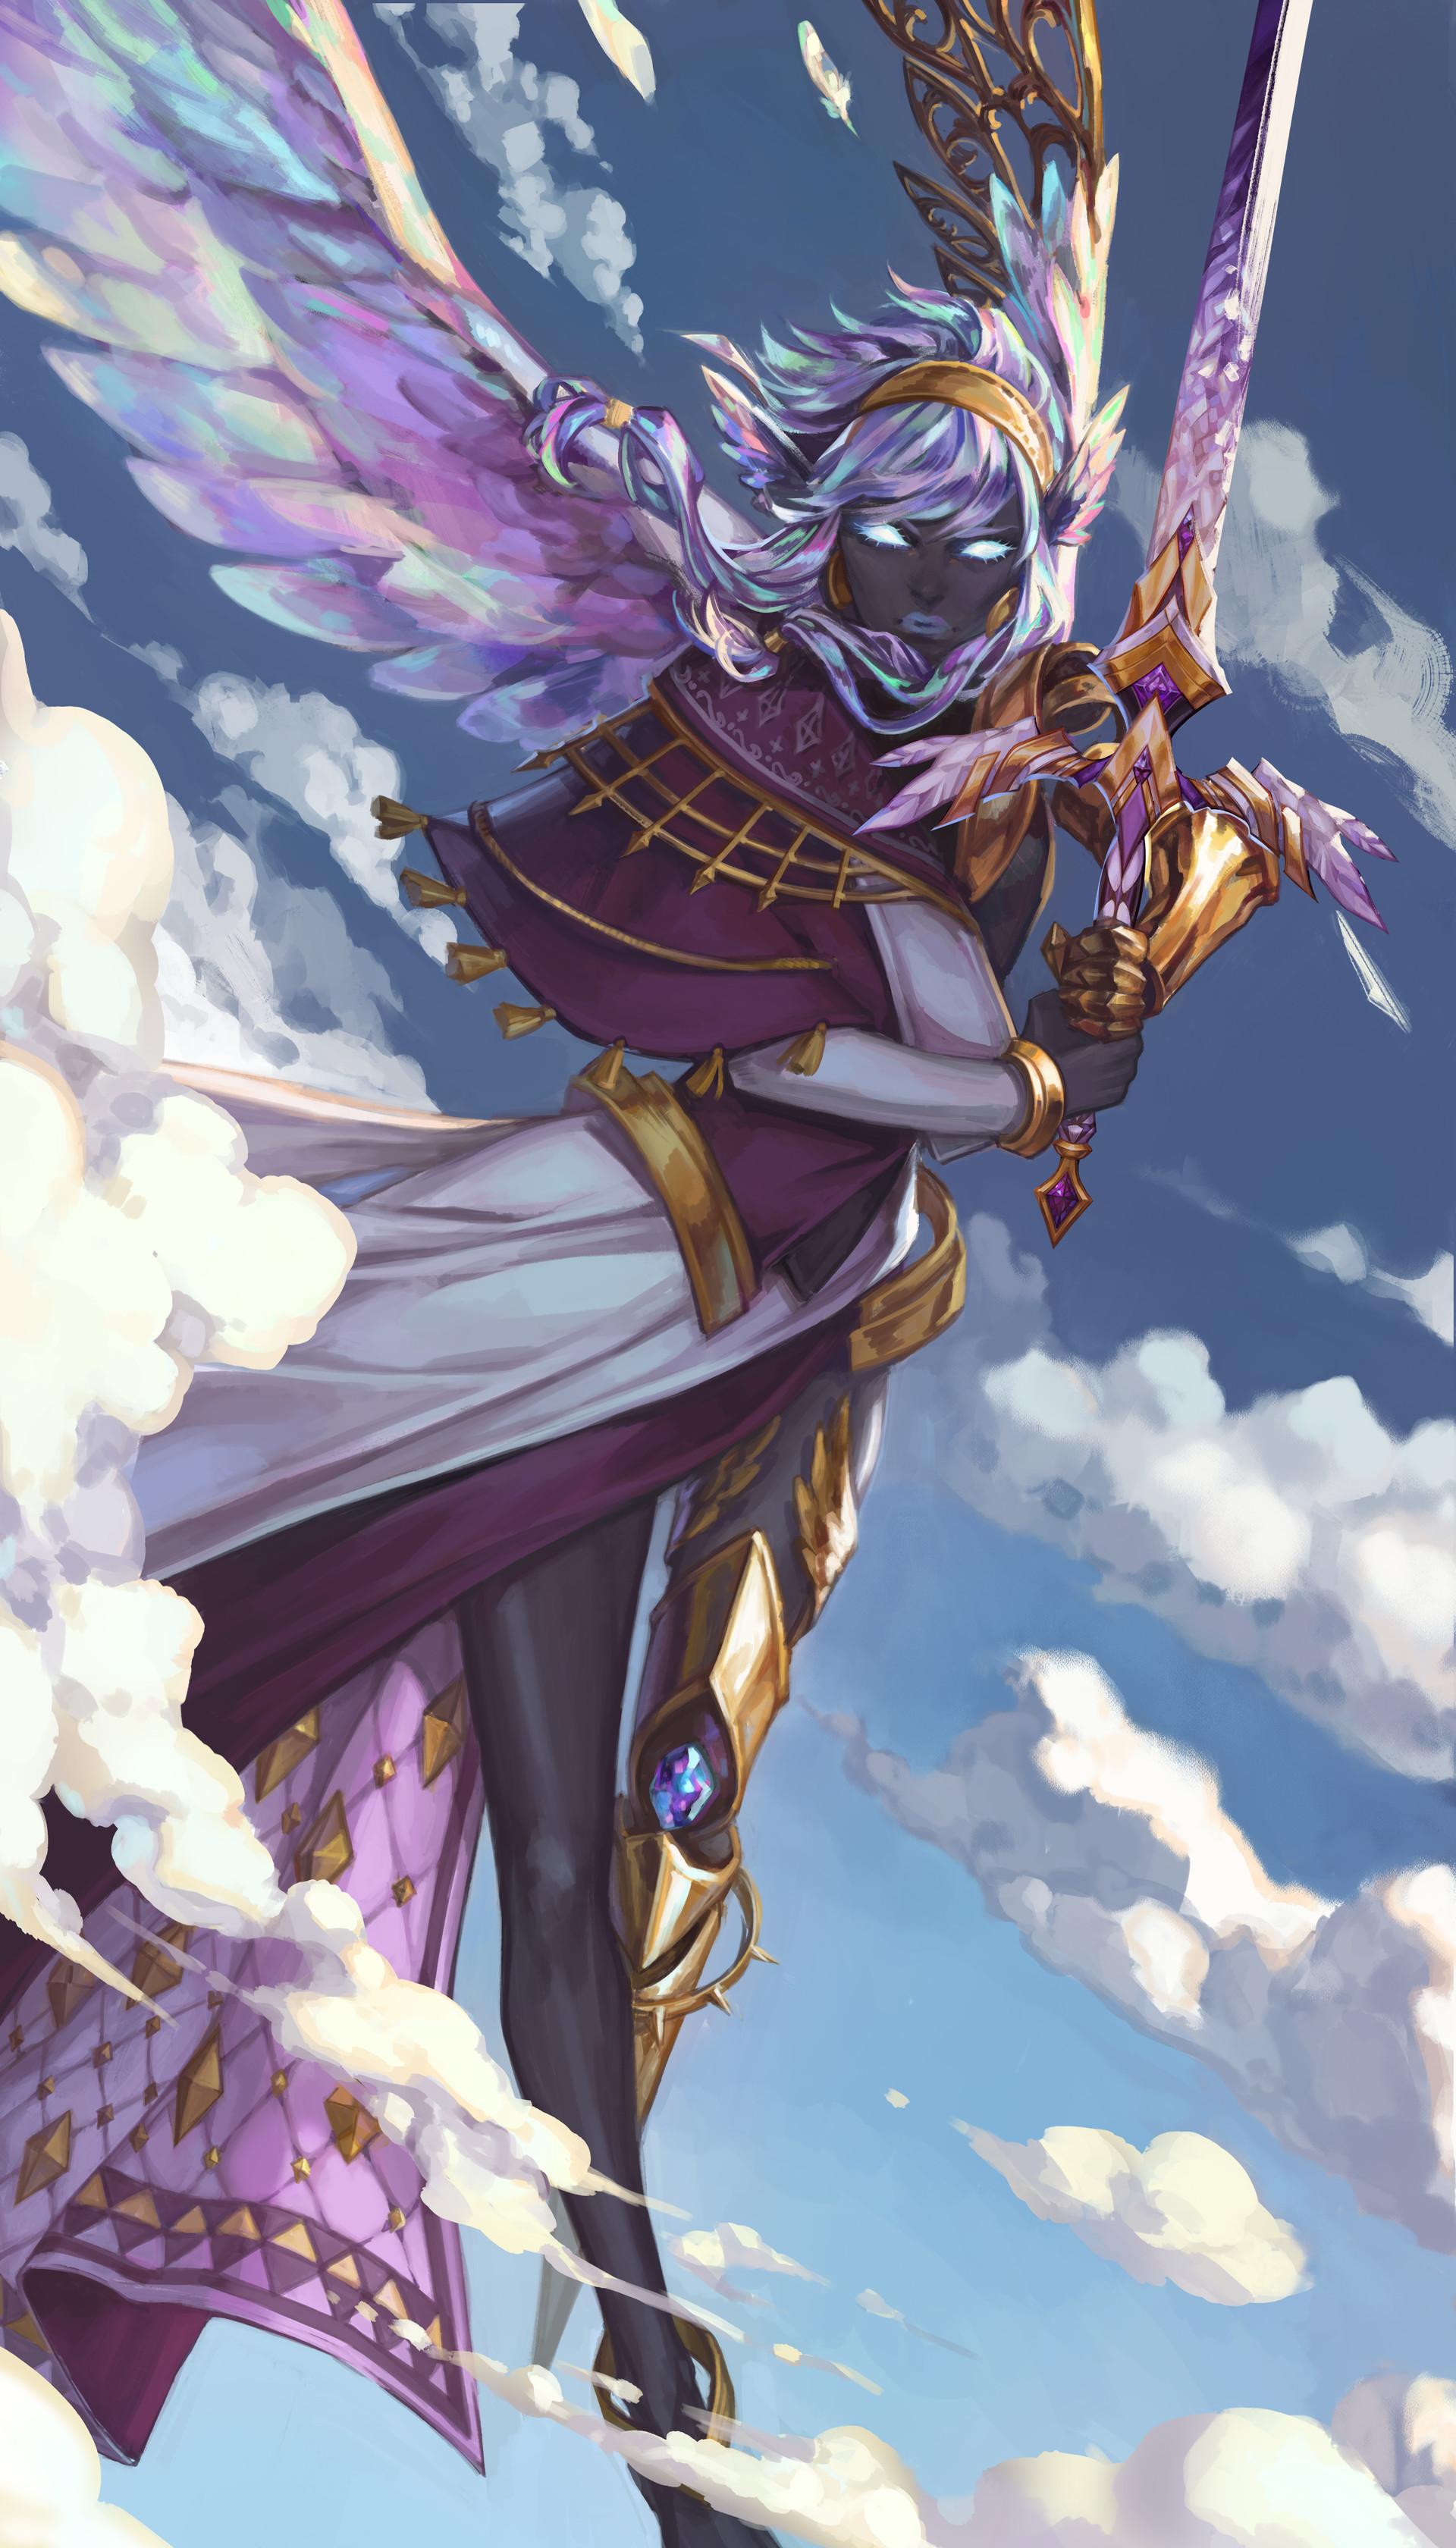 Noa ikeda swords knight